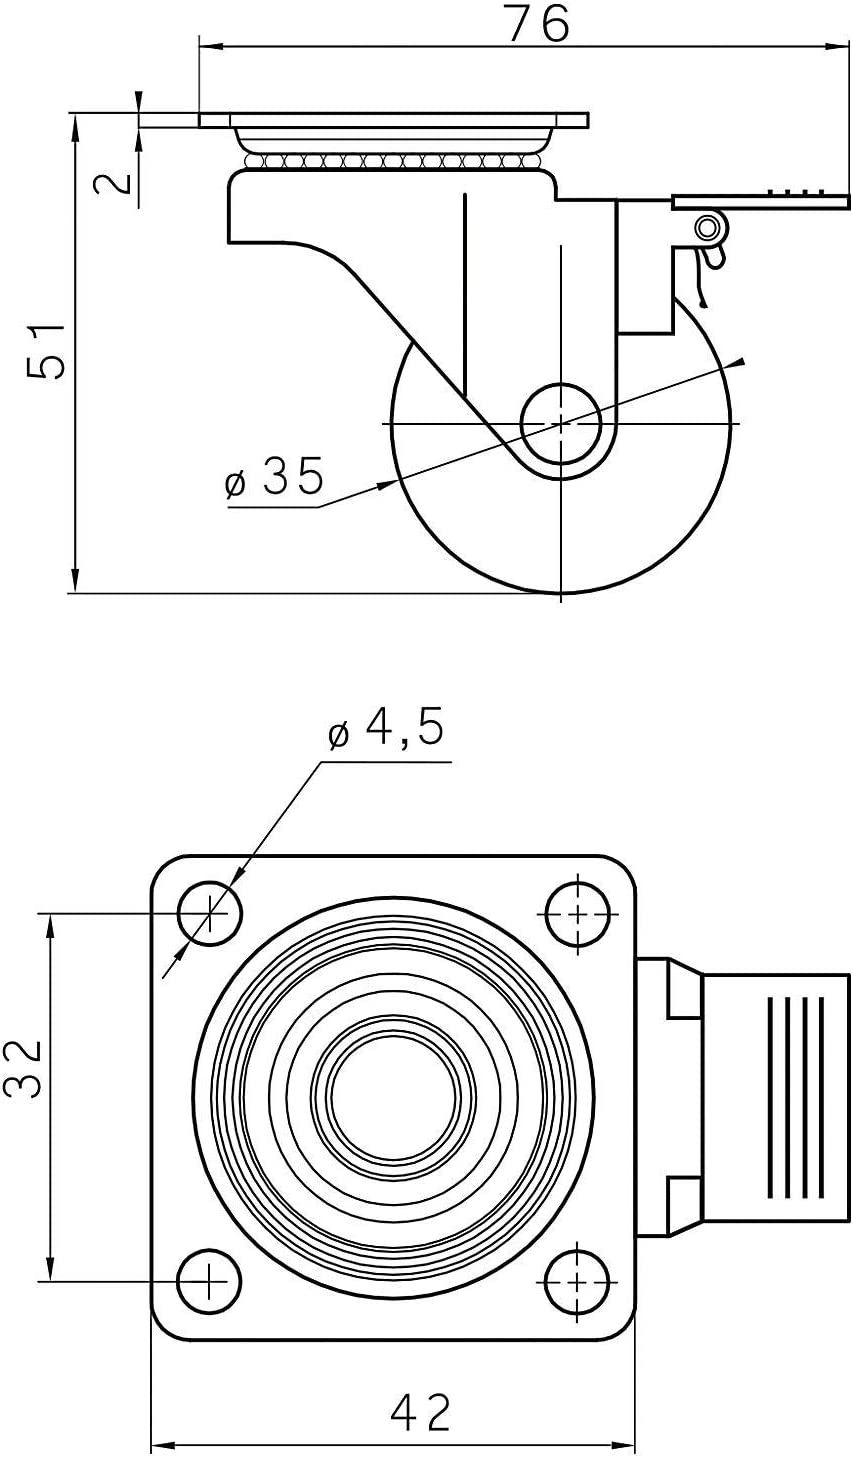 SOTECH M/öbelrolle SWIFT /Ø 35 mm schwarz Lenkrolle Bockrolle mit Feststeller